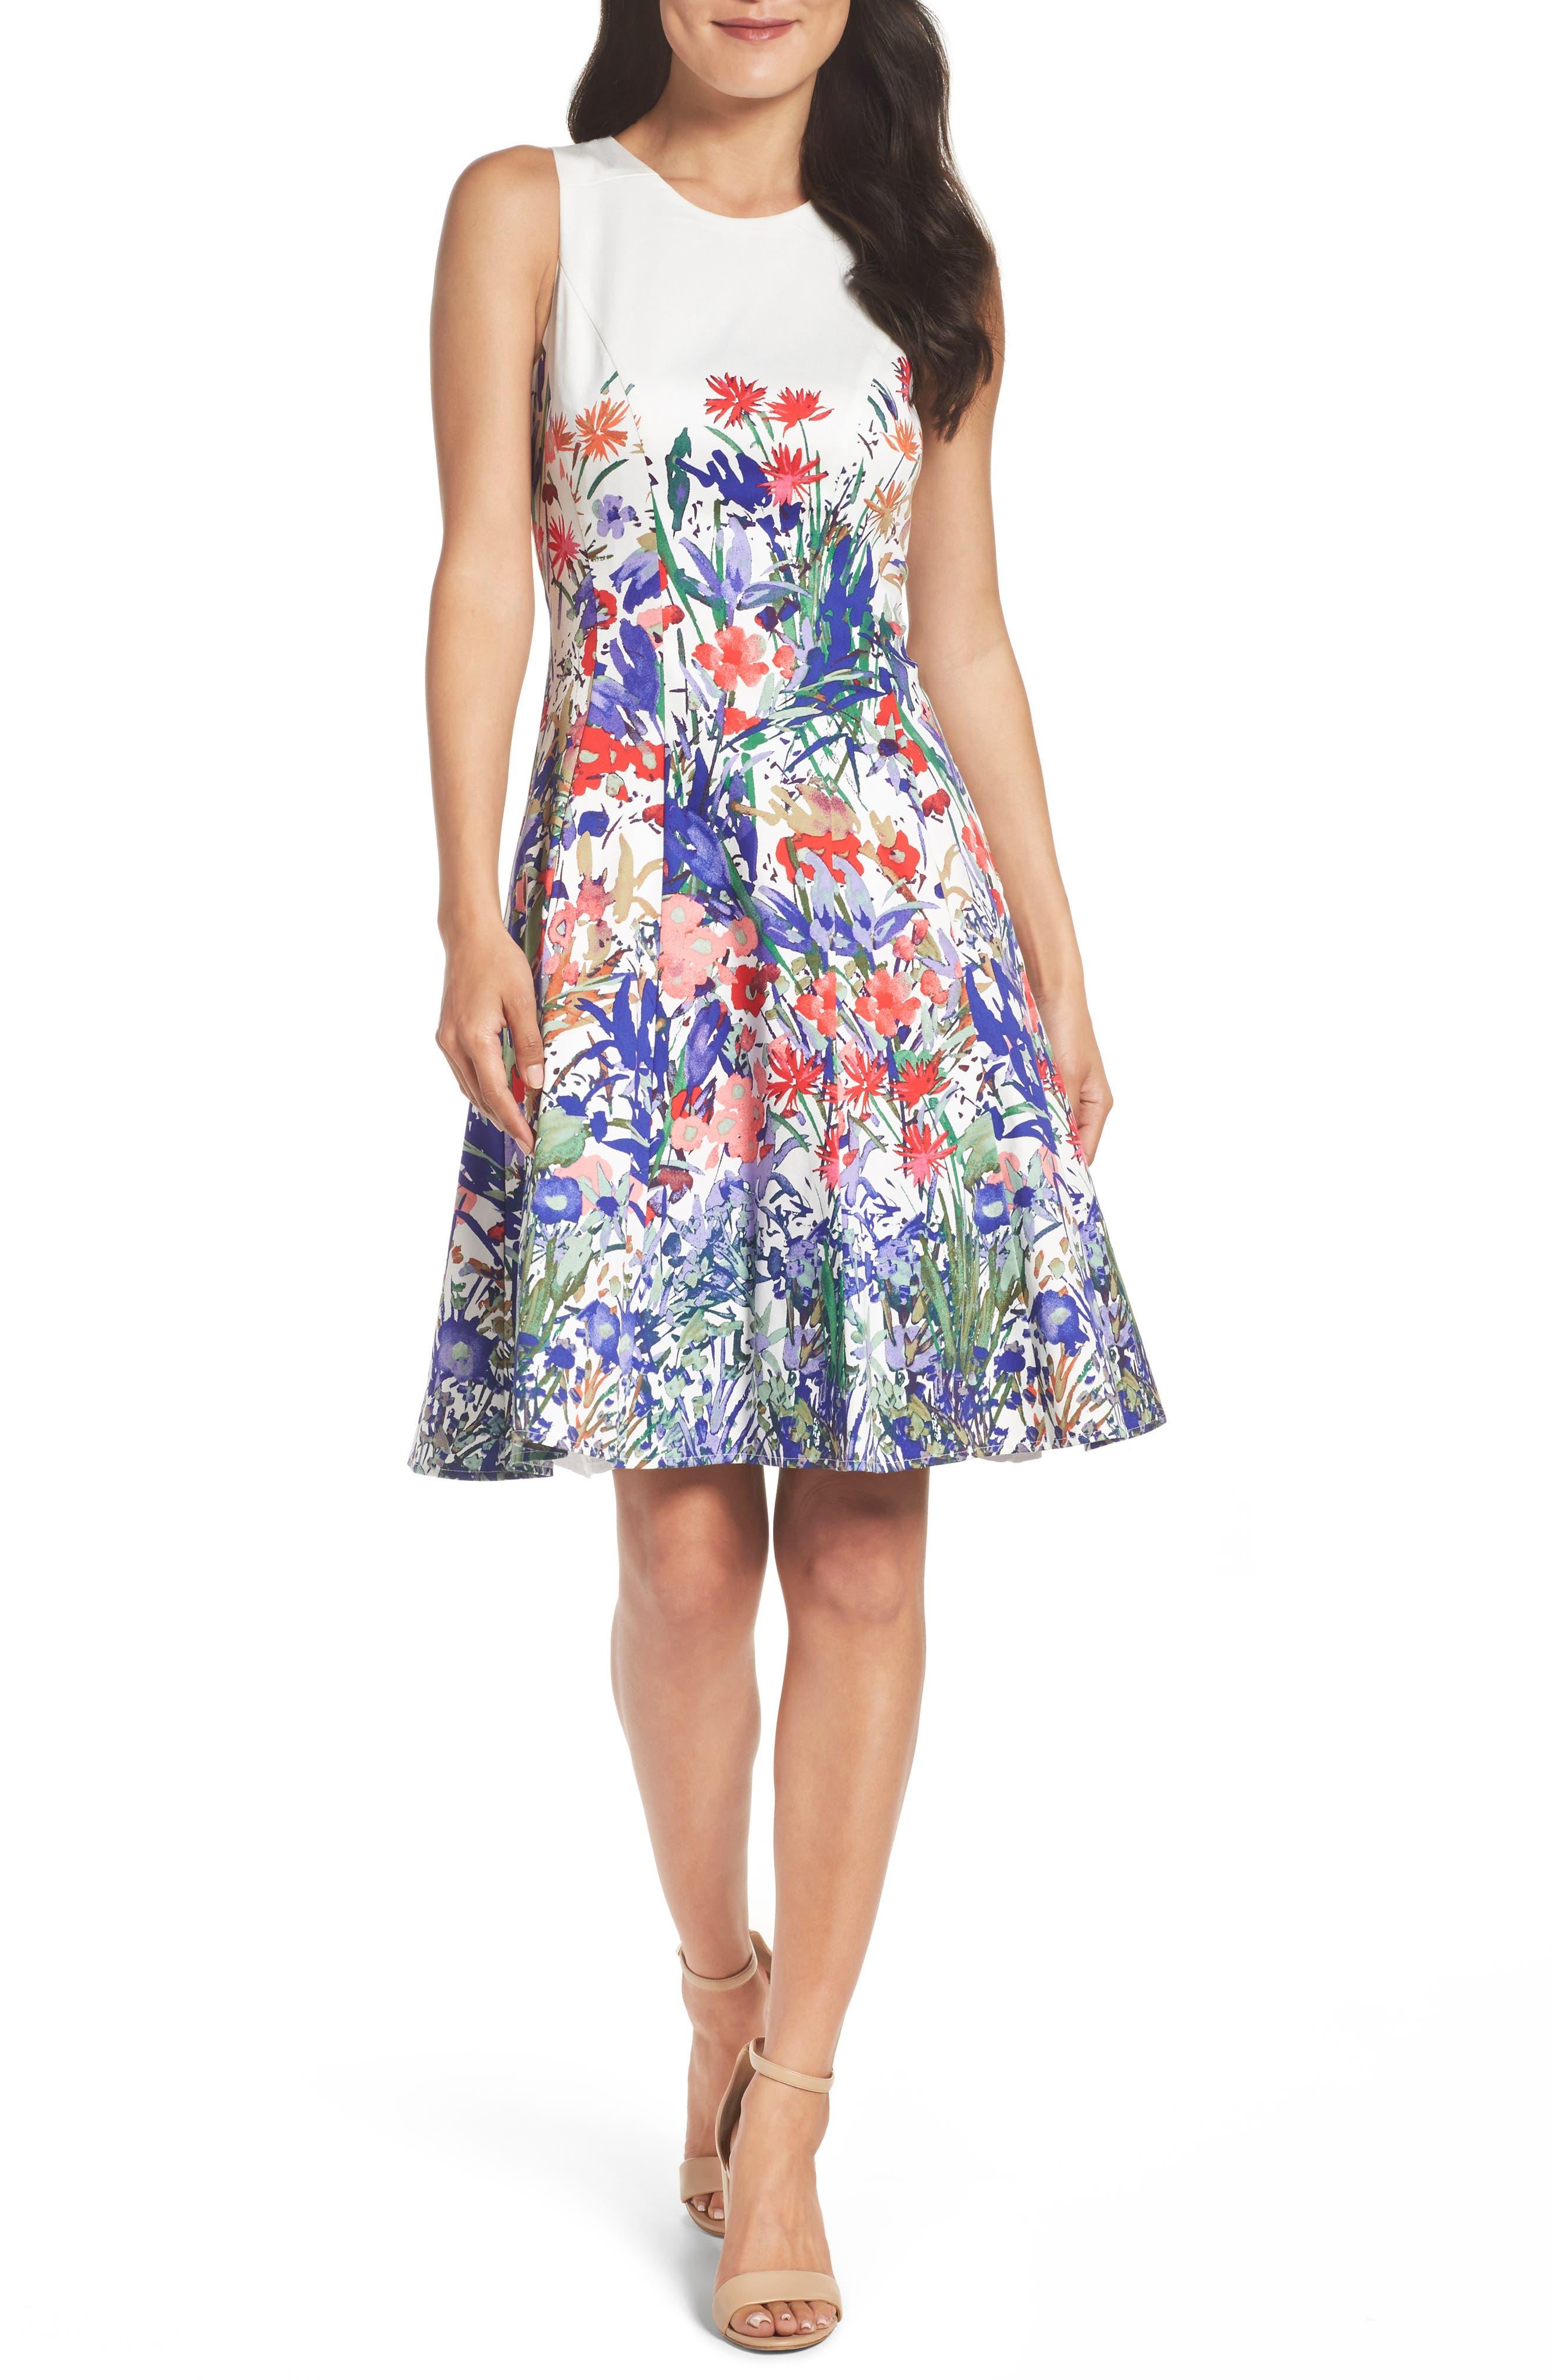 Cottage Garden Fit & Flare Dress,                             Main thumbnail 1, color,                             Soft White/ Coral/ Purple